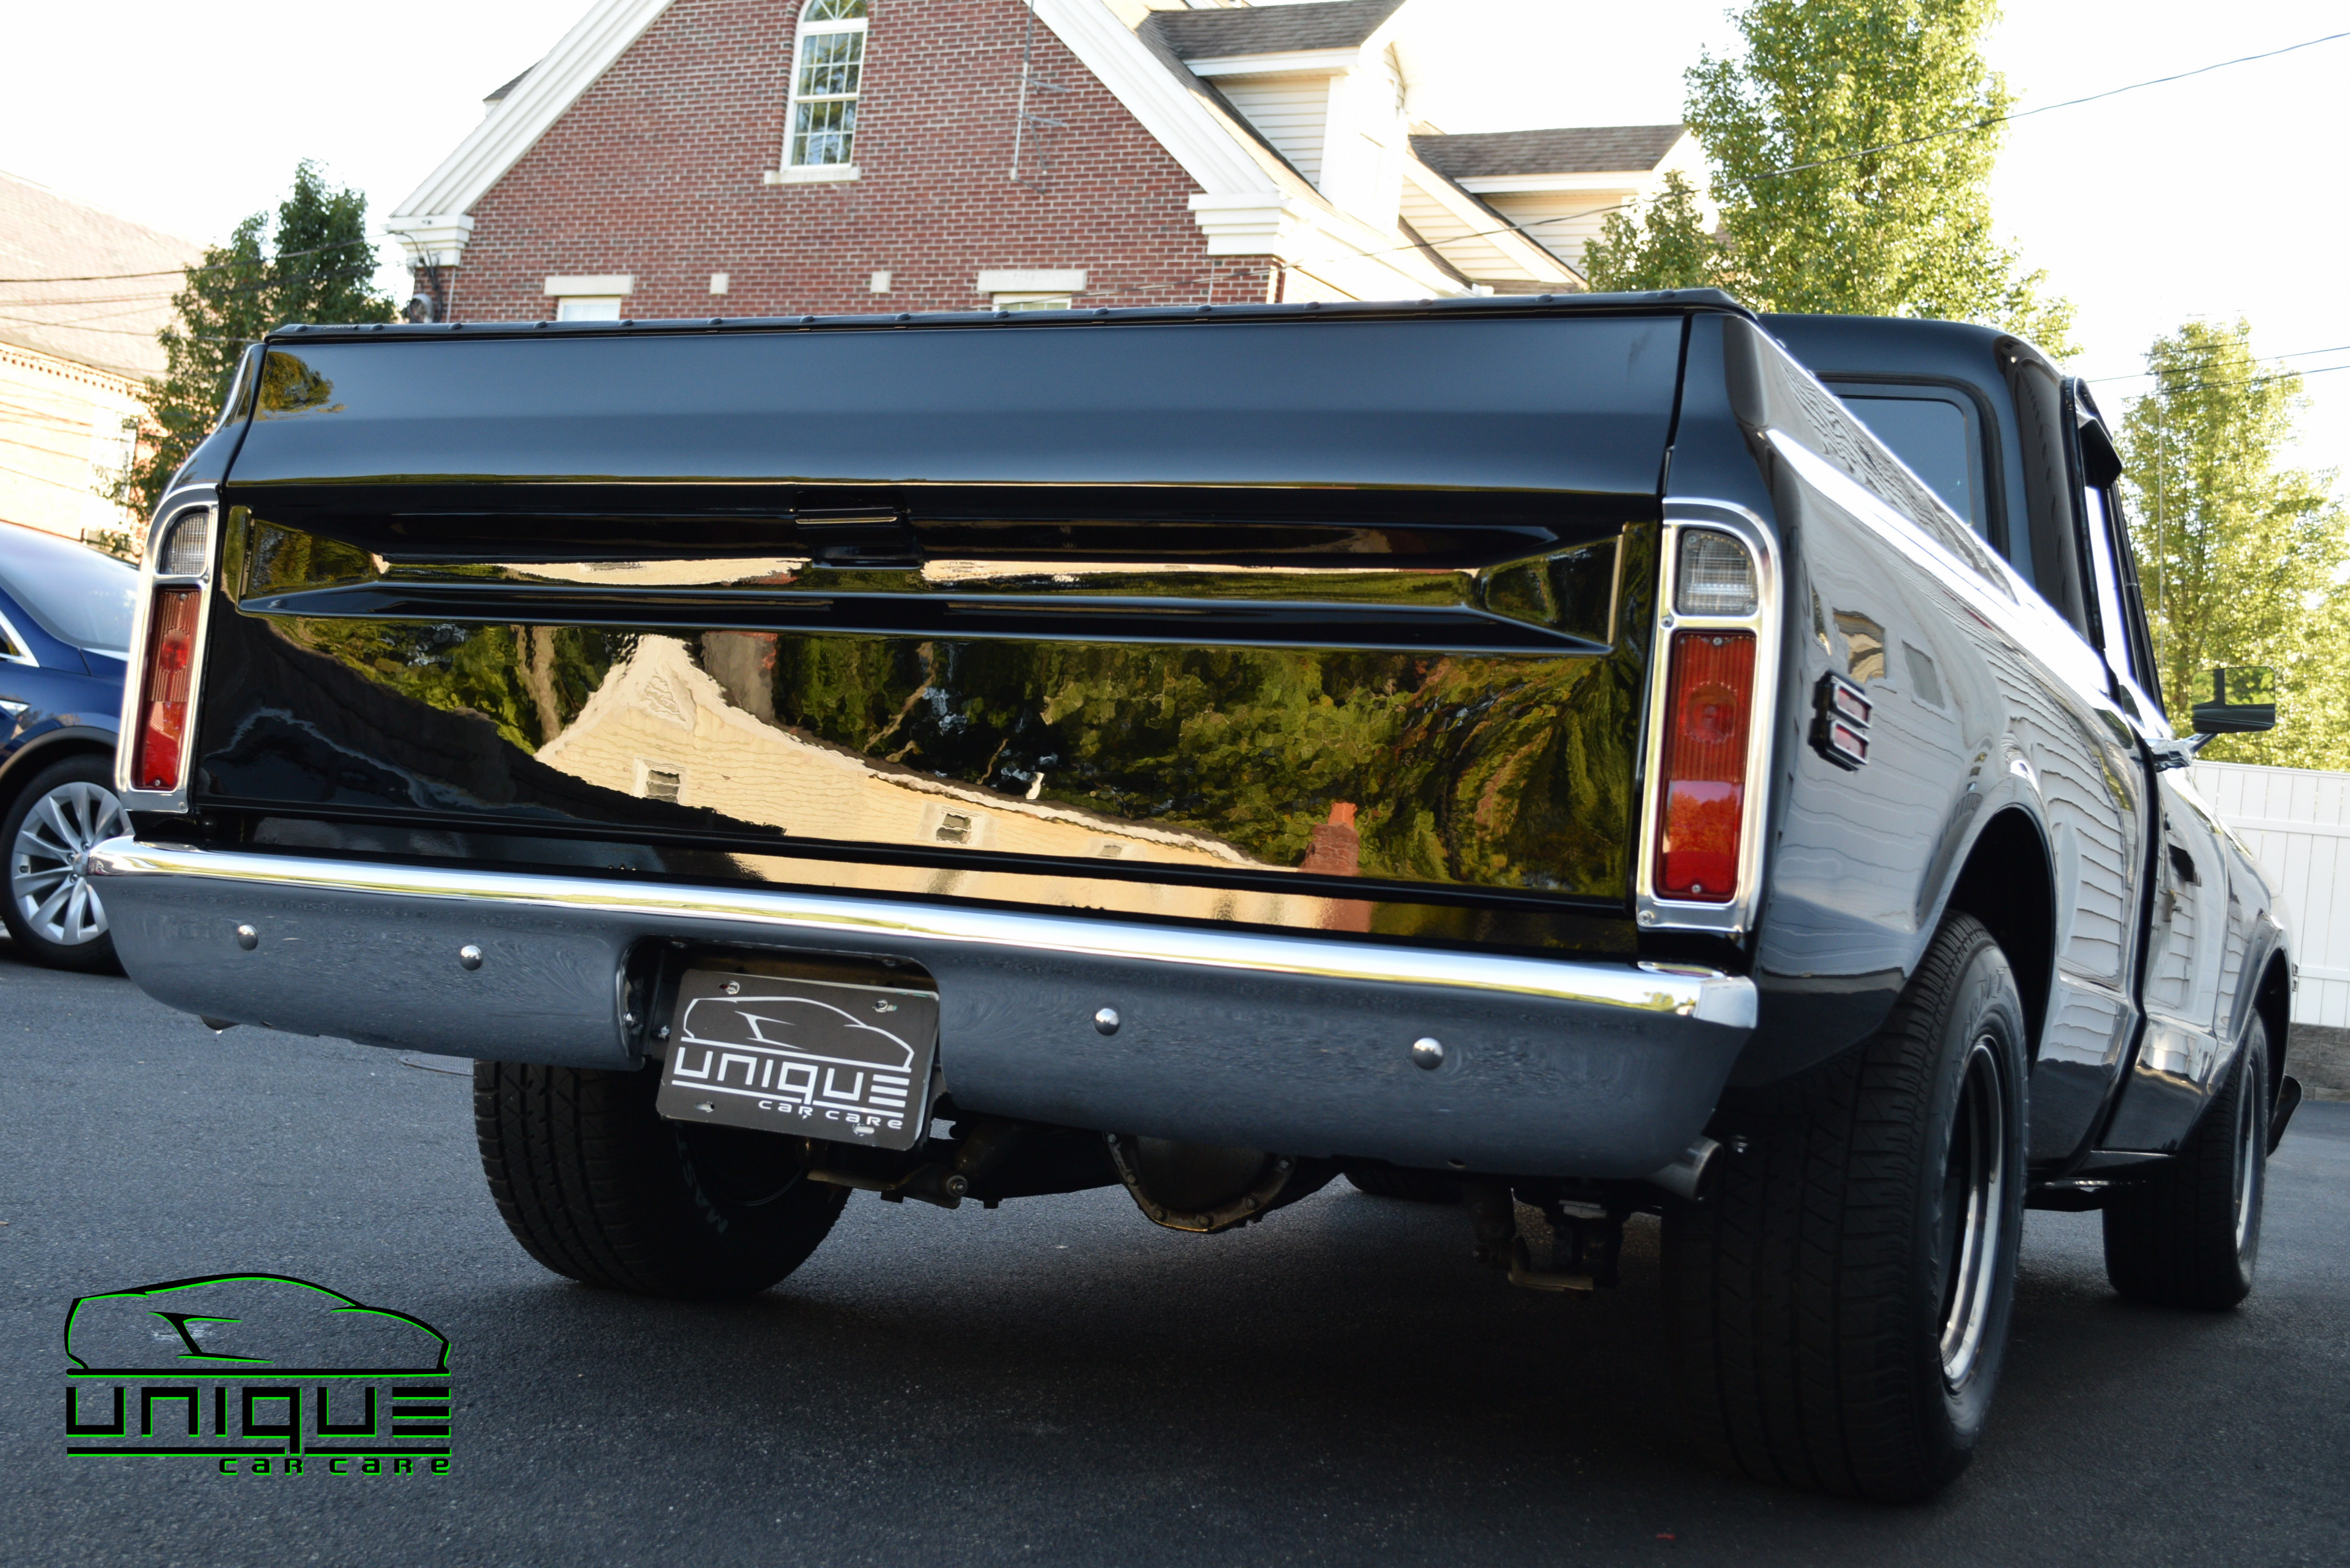 UCC_Custom 72' Chevy Pick up-78